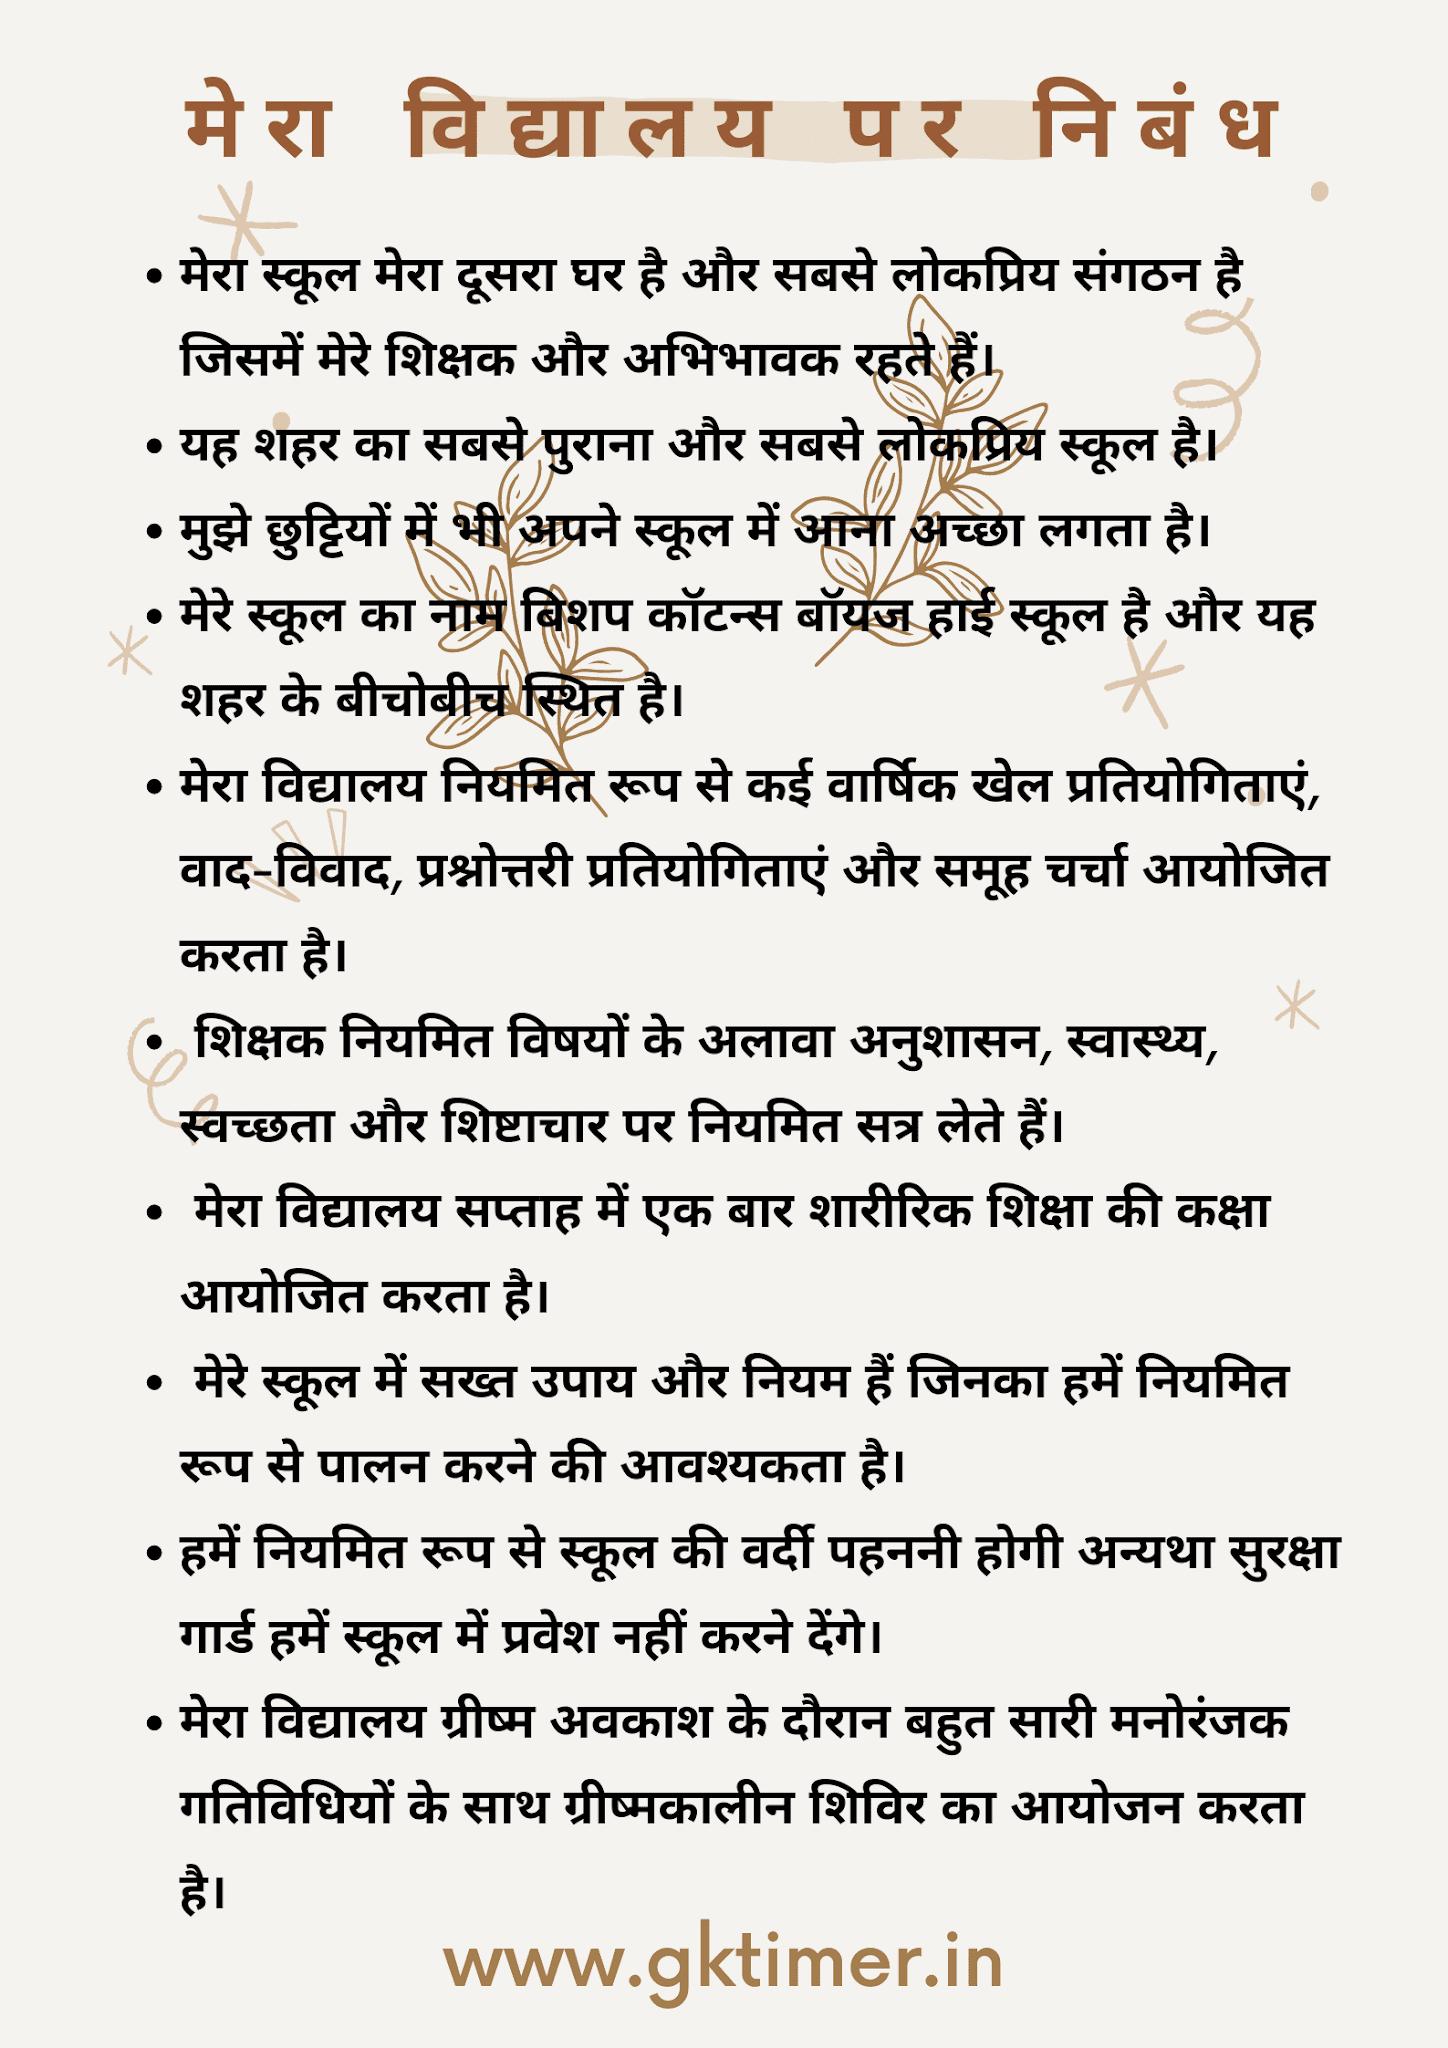 मेरा विद्यालय पर निबंध   My School Essay in Hindi   10 Lines on My School in Hindi